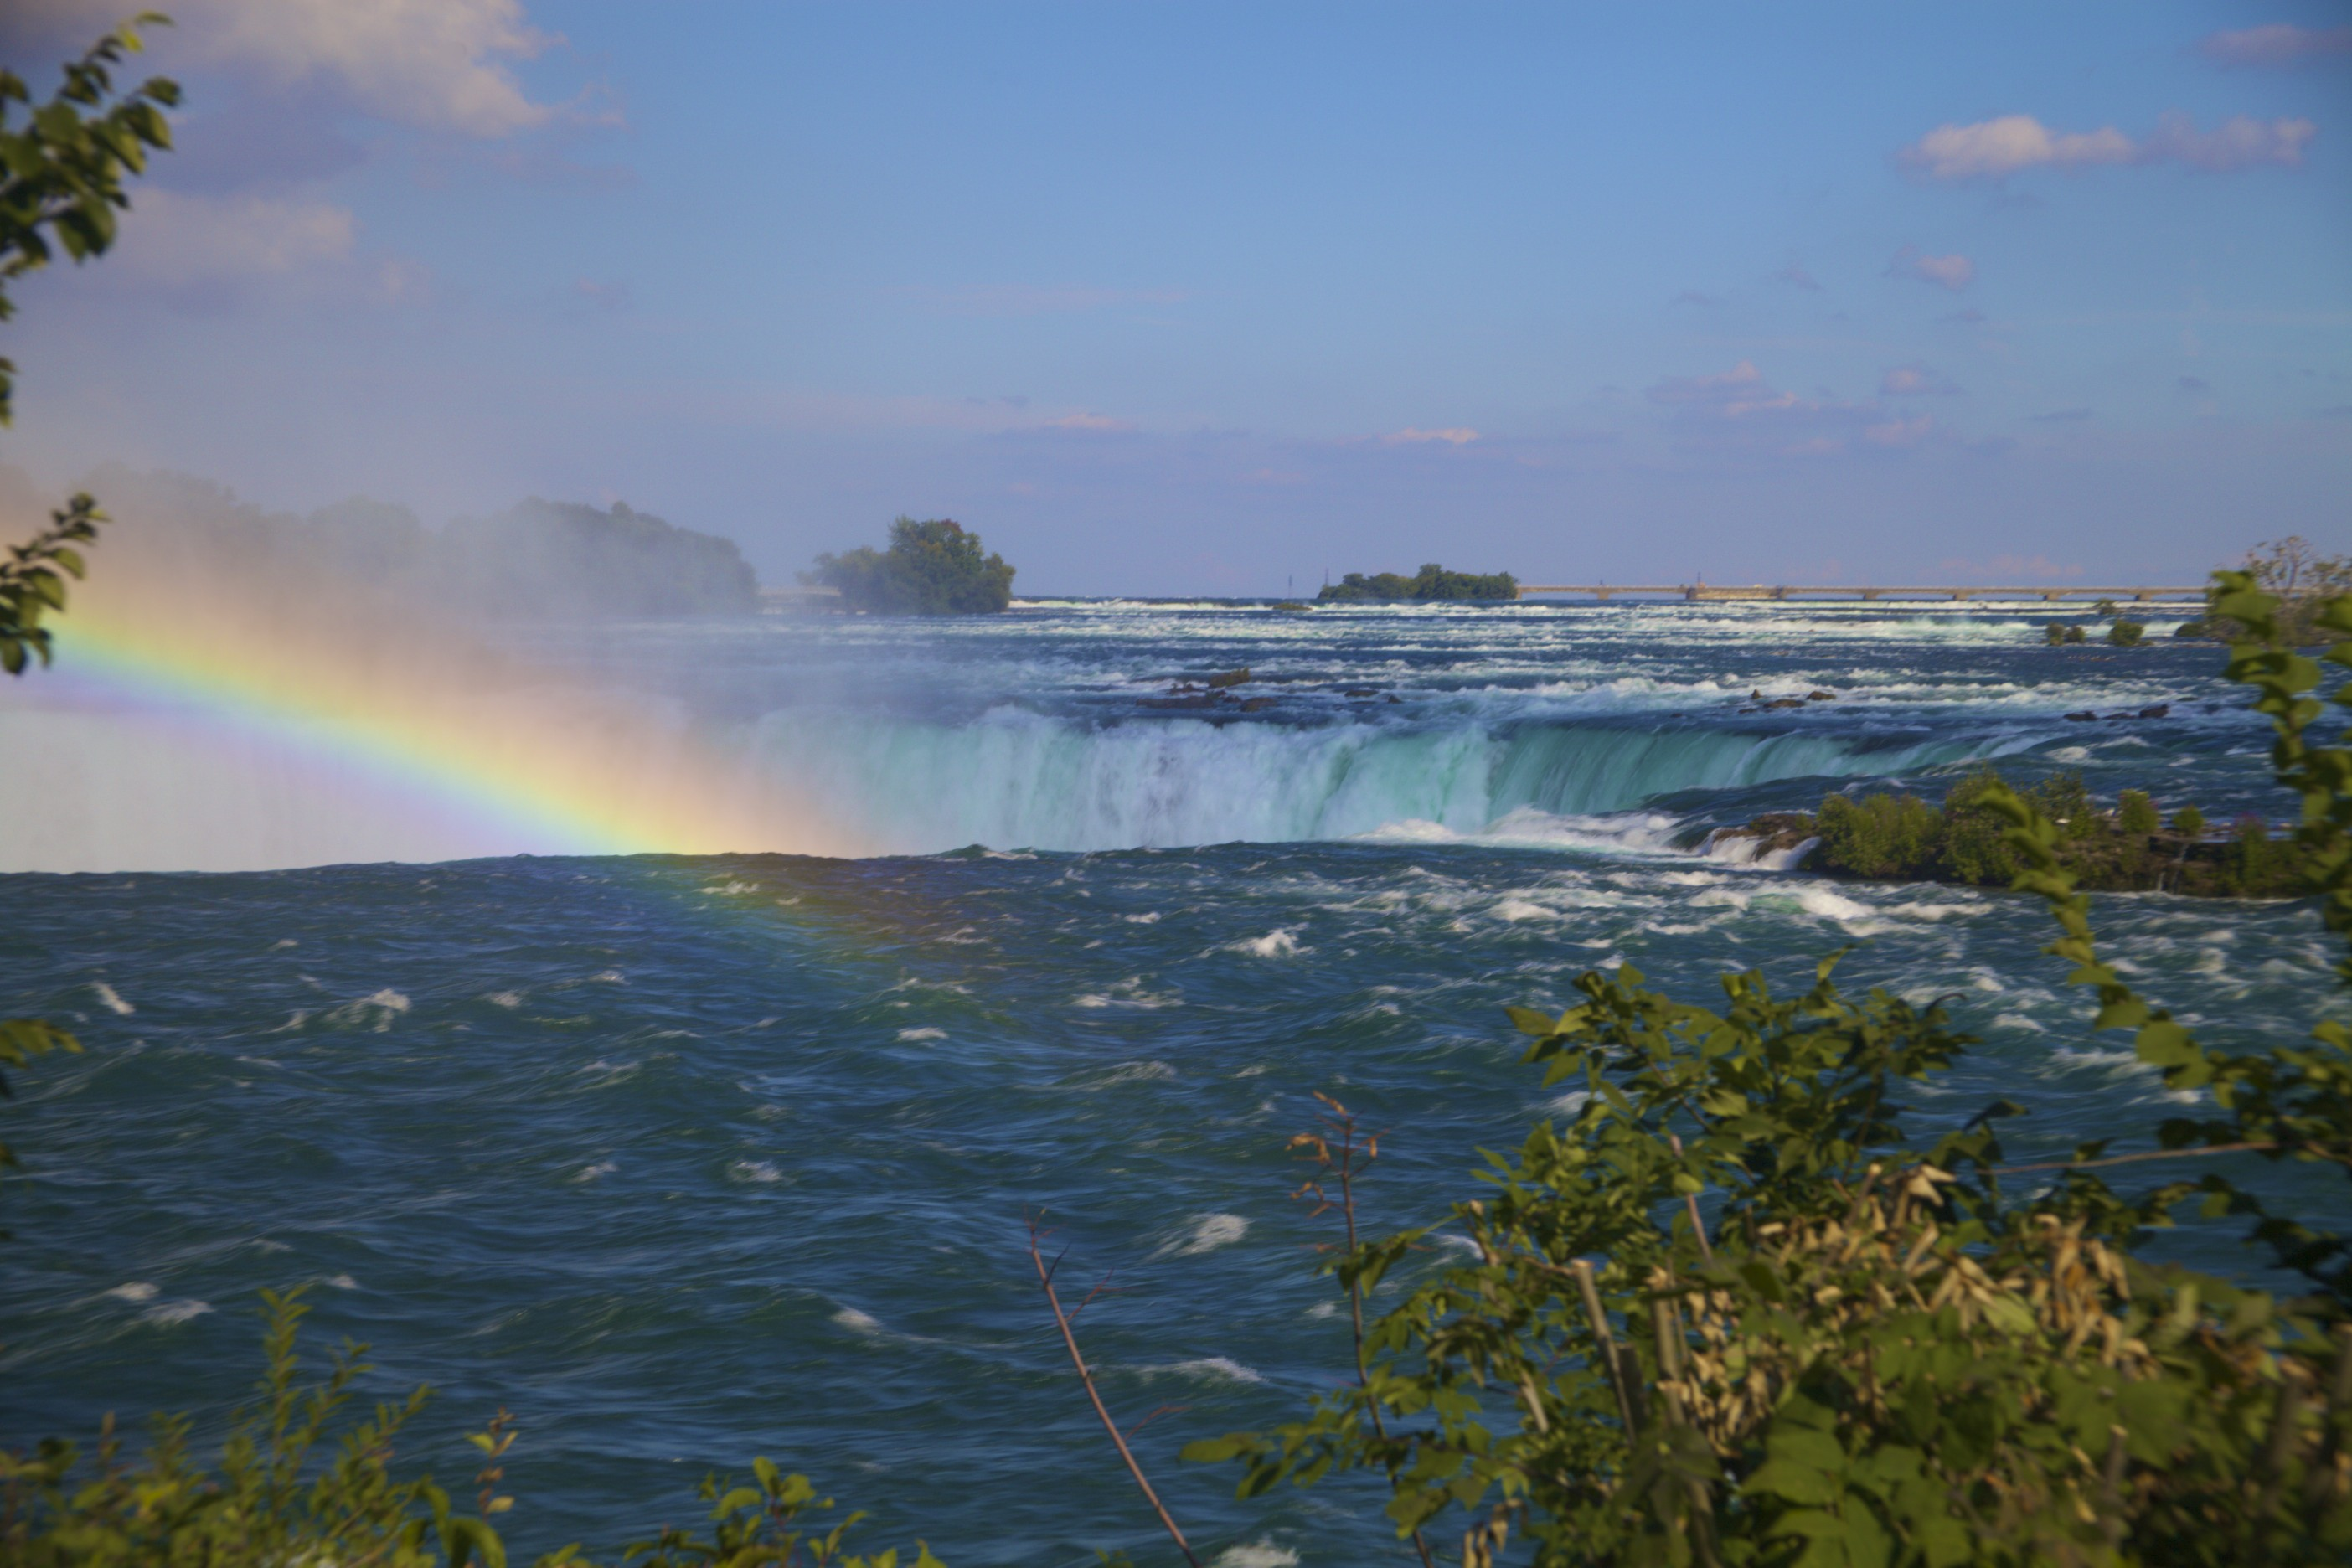 Going over Horseshoe Falls @ Niagara